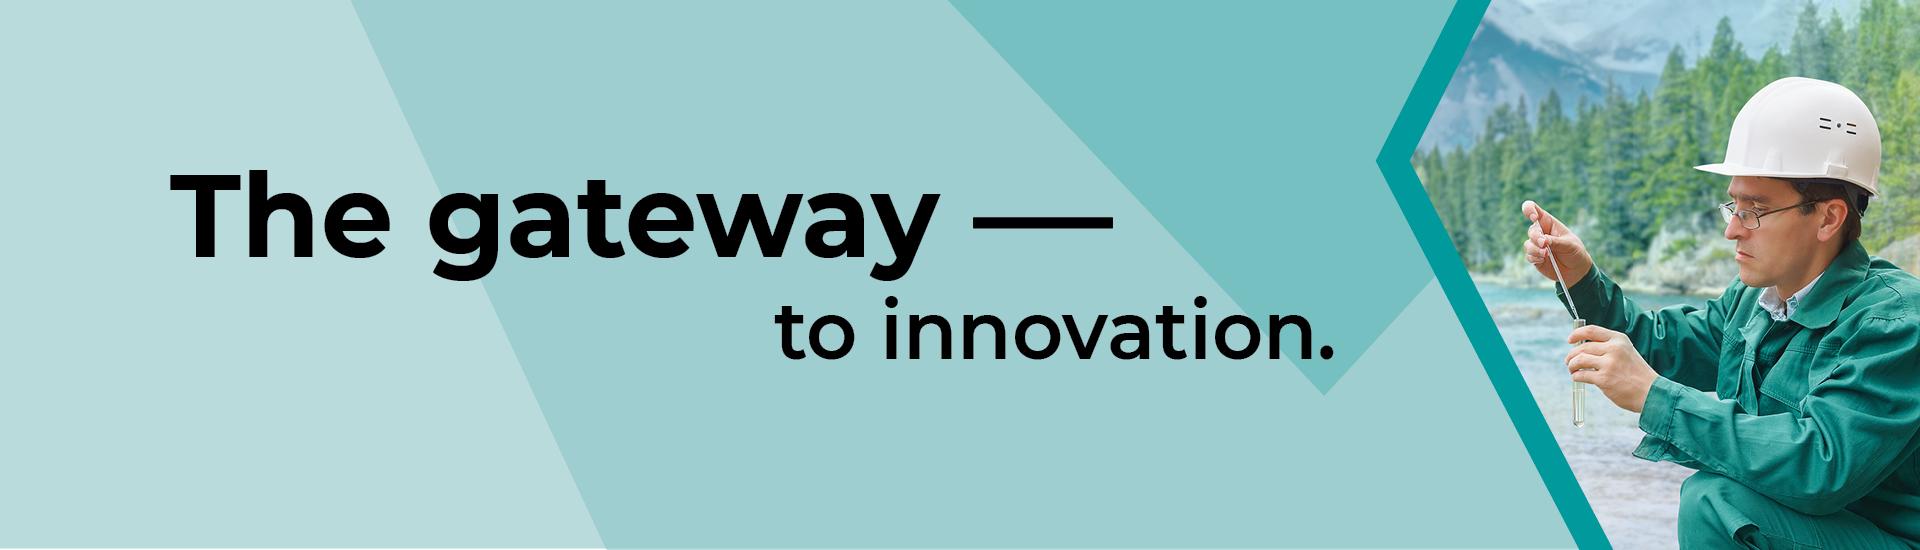 gateway-experience-innovation-hero3